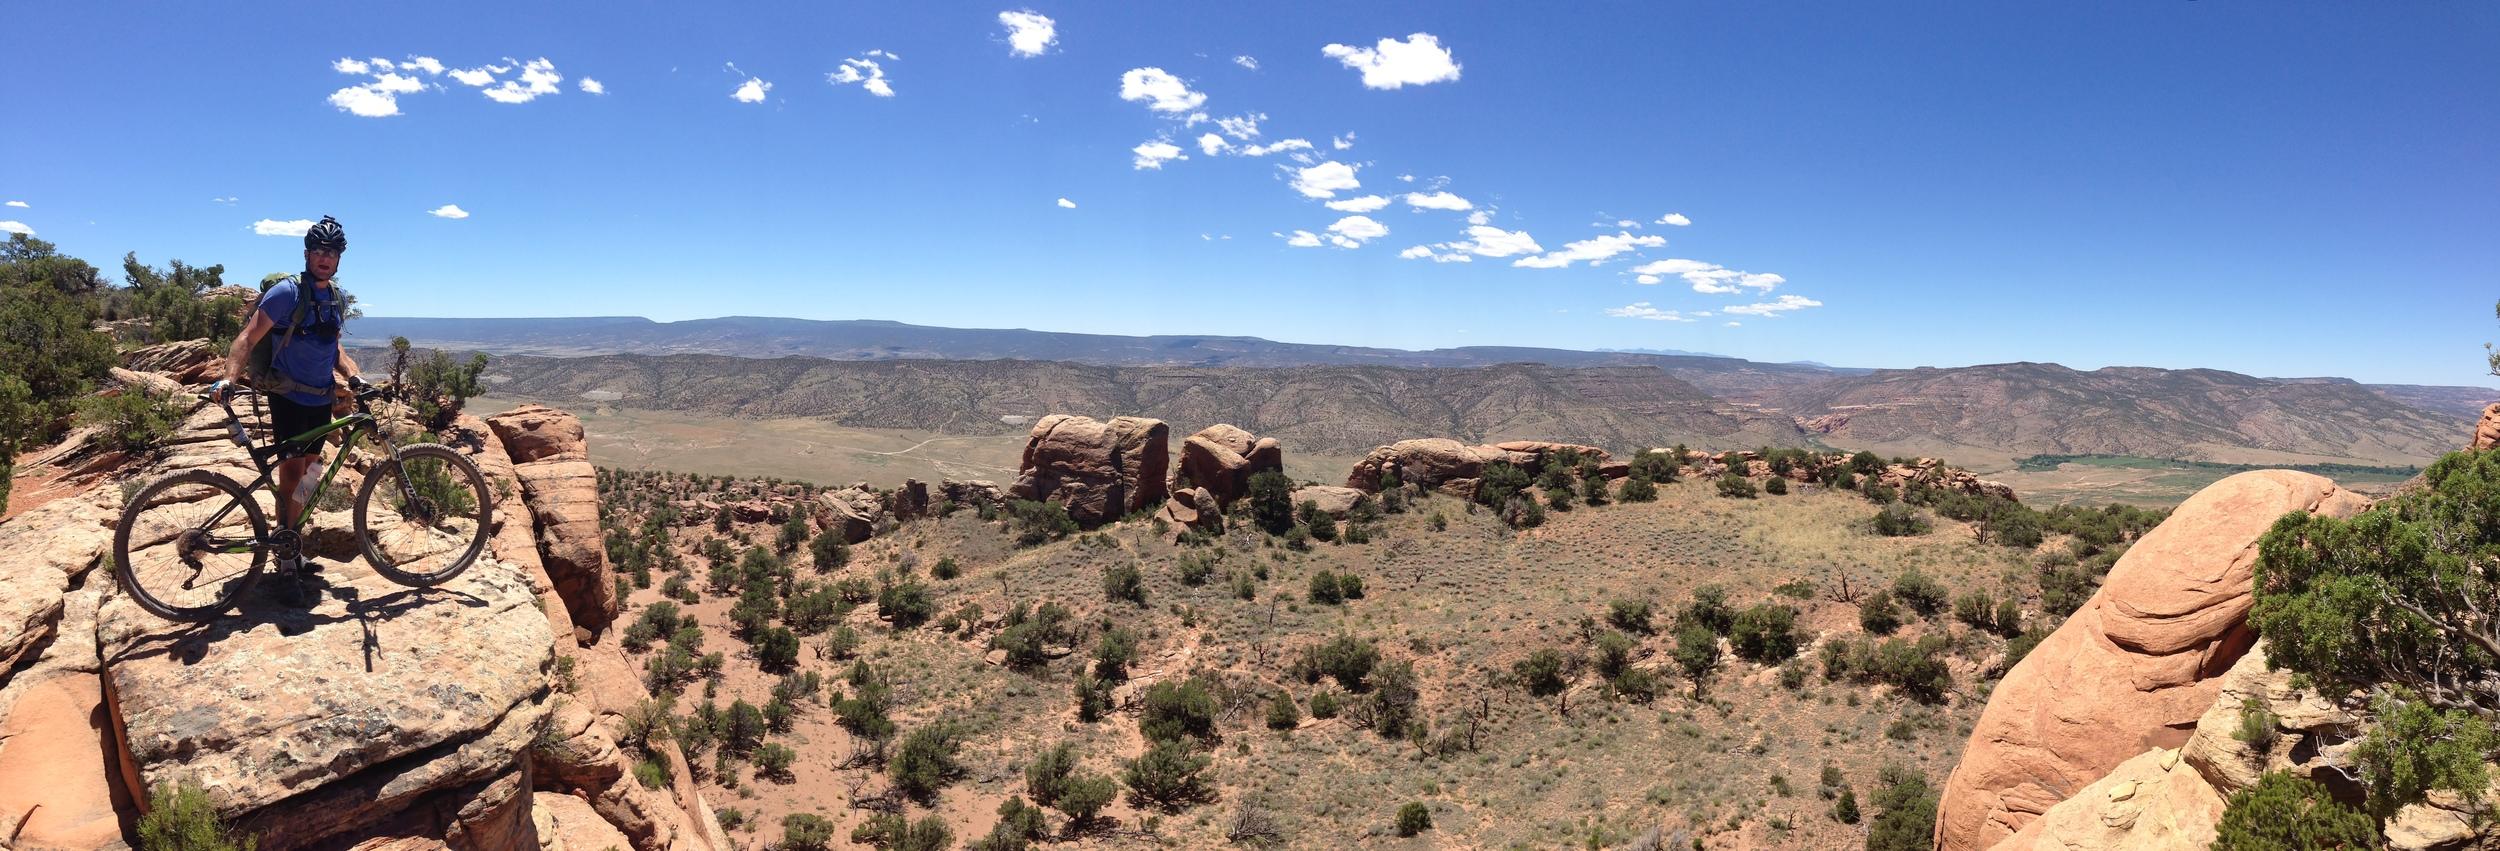 dry valley views